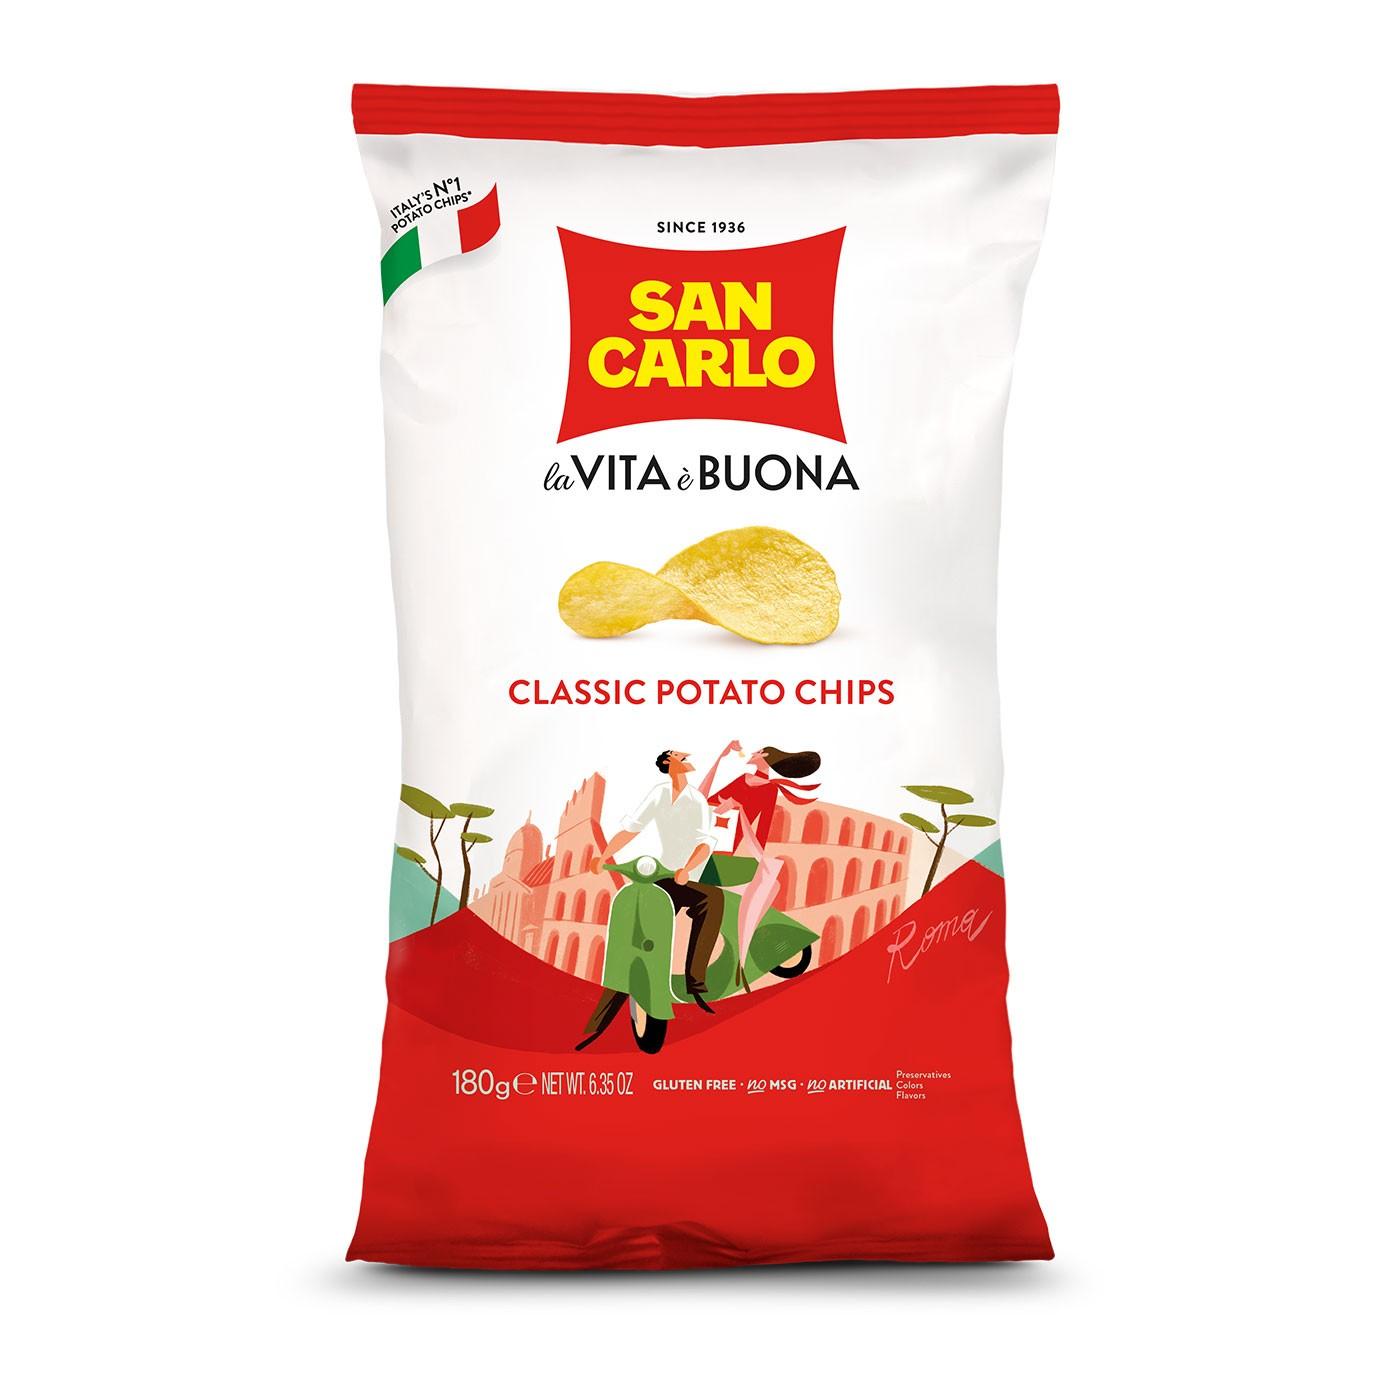 Classic Potato Chips 6.3 oz  - San Carlo